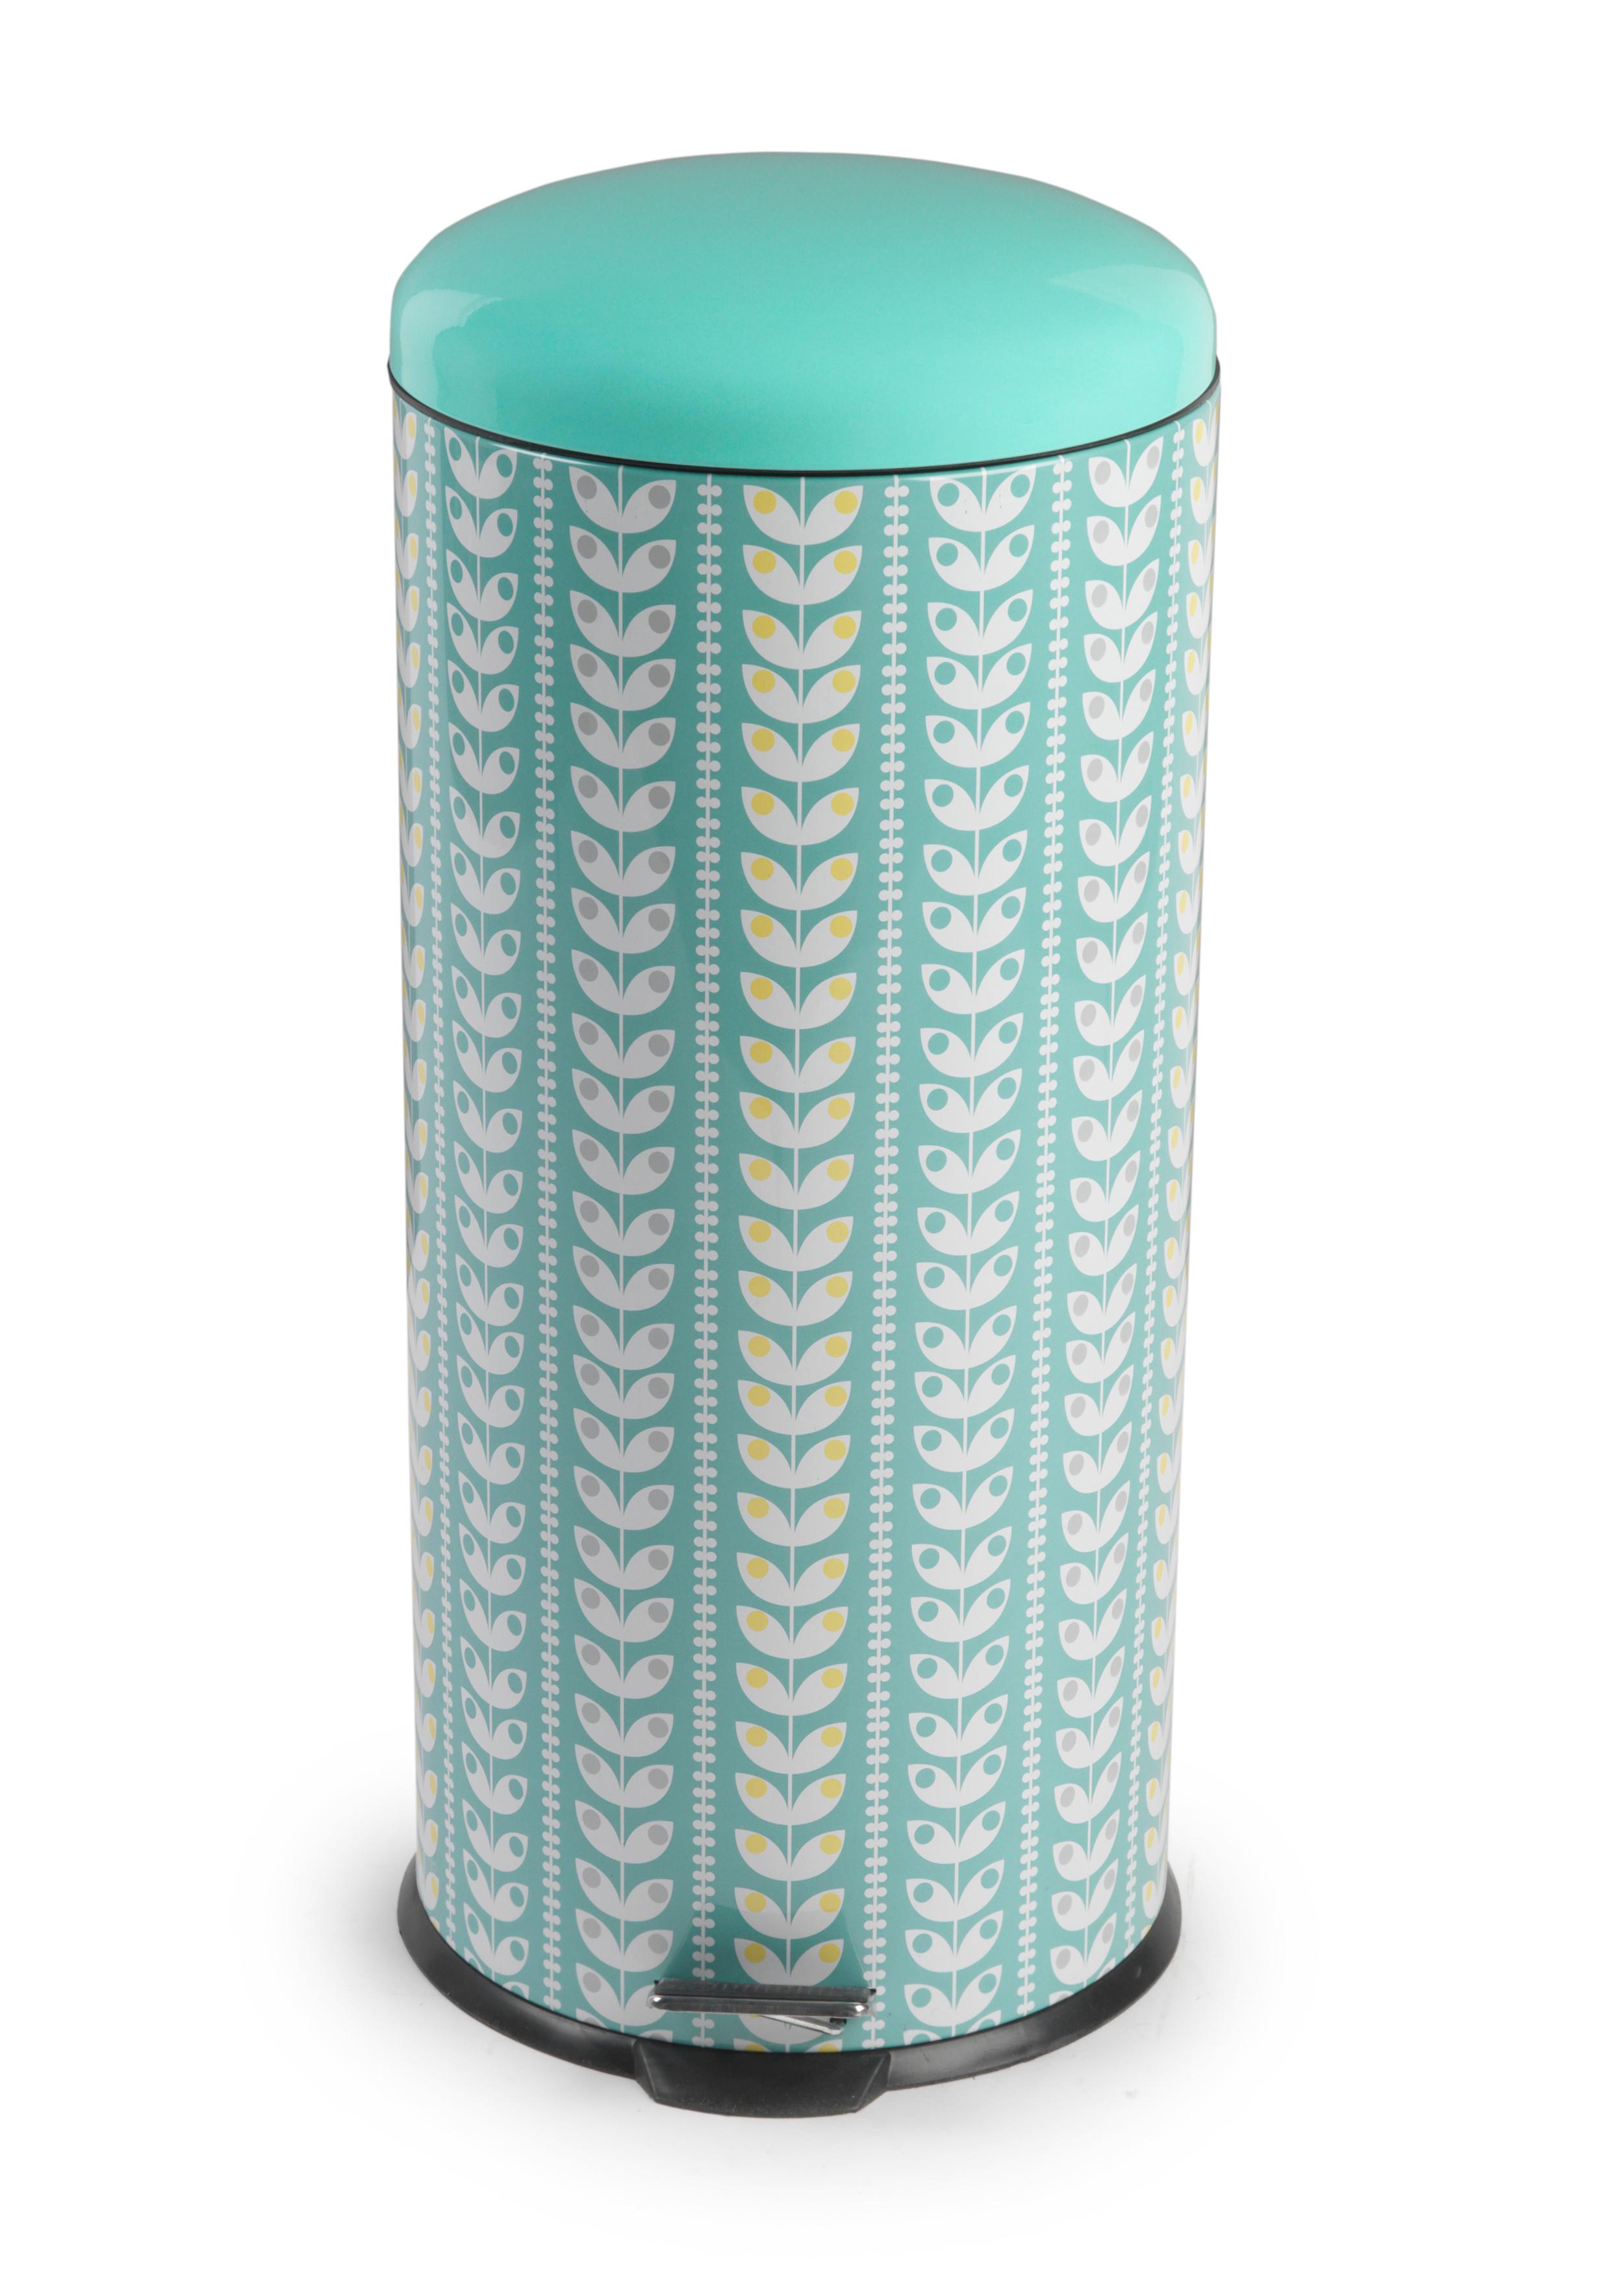 Salter Bw04606 Retro Leaf Kitchen Pedal Bin 30 Litre Turquoise